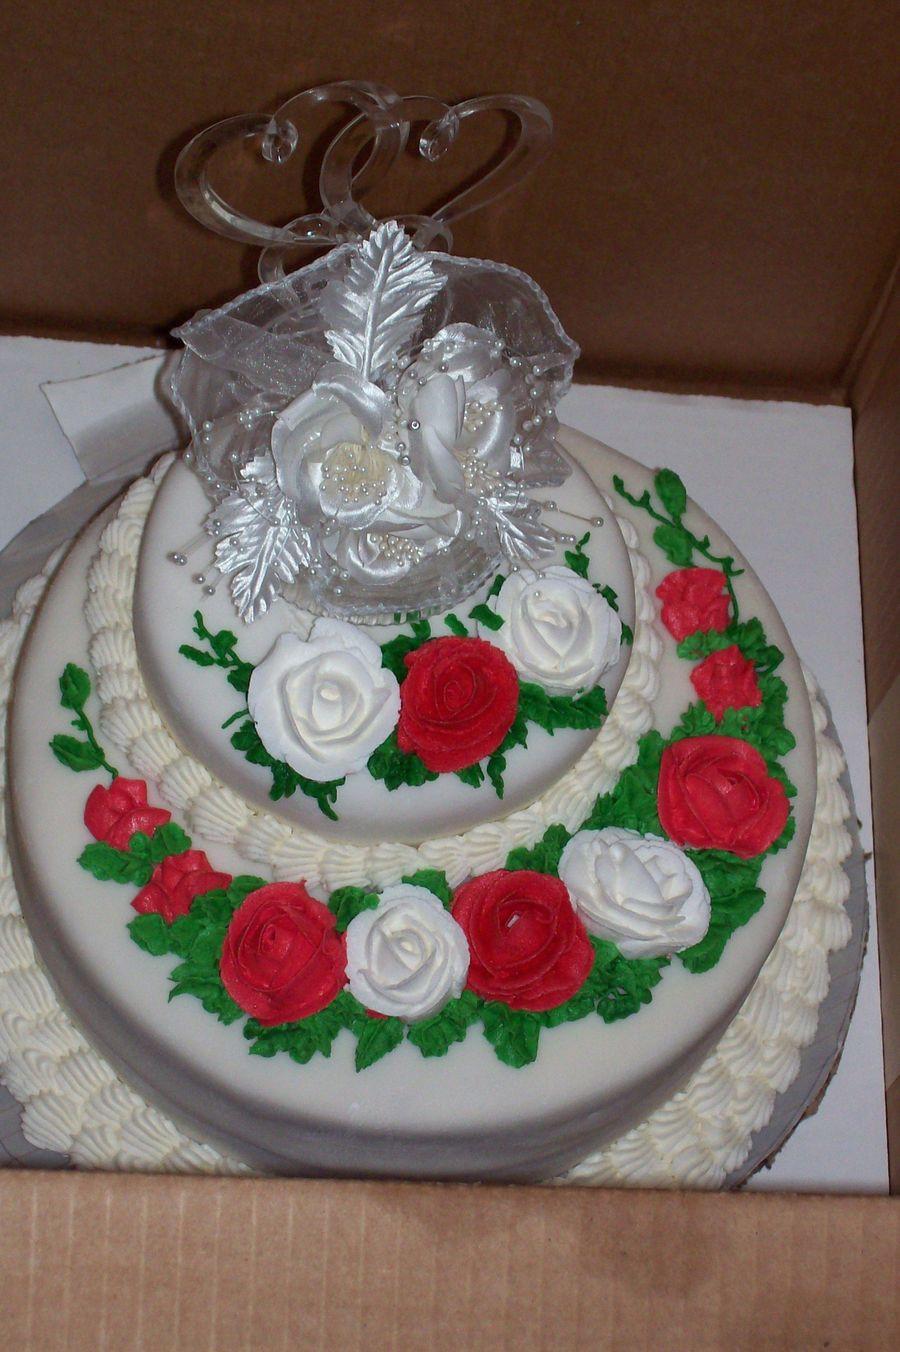 Gatlinburg Wedding Cakes  Wedding Cake And Gatlinburg 00 CakeCentral